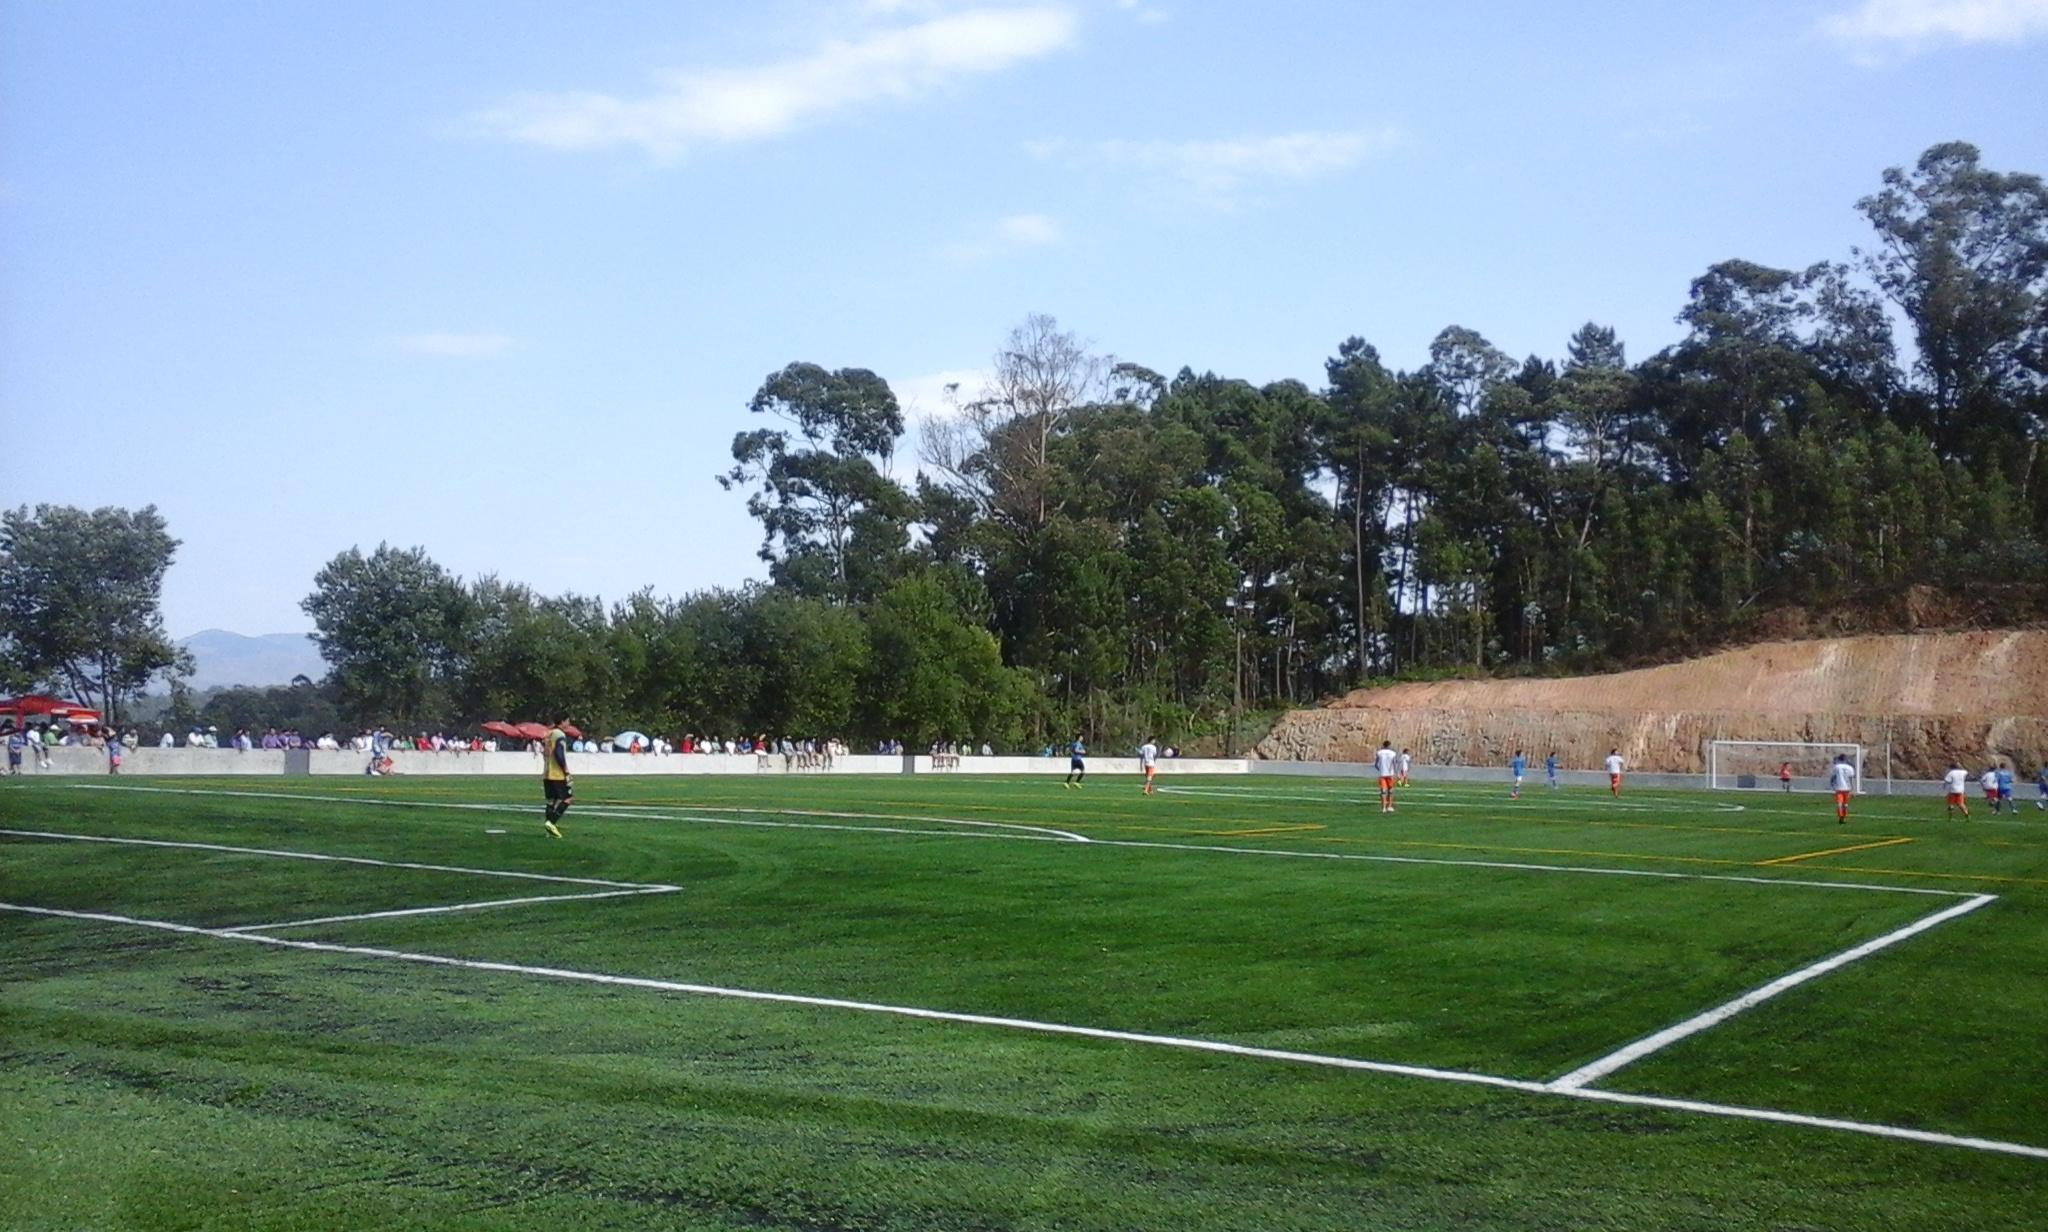 Campo de Futebol da Lixa